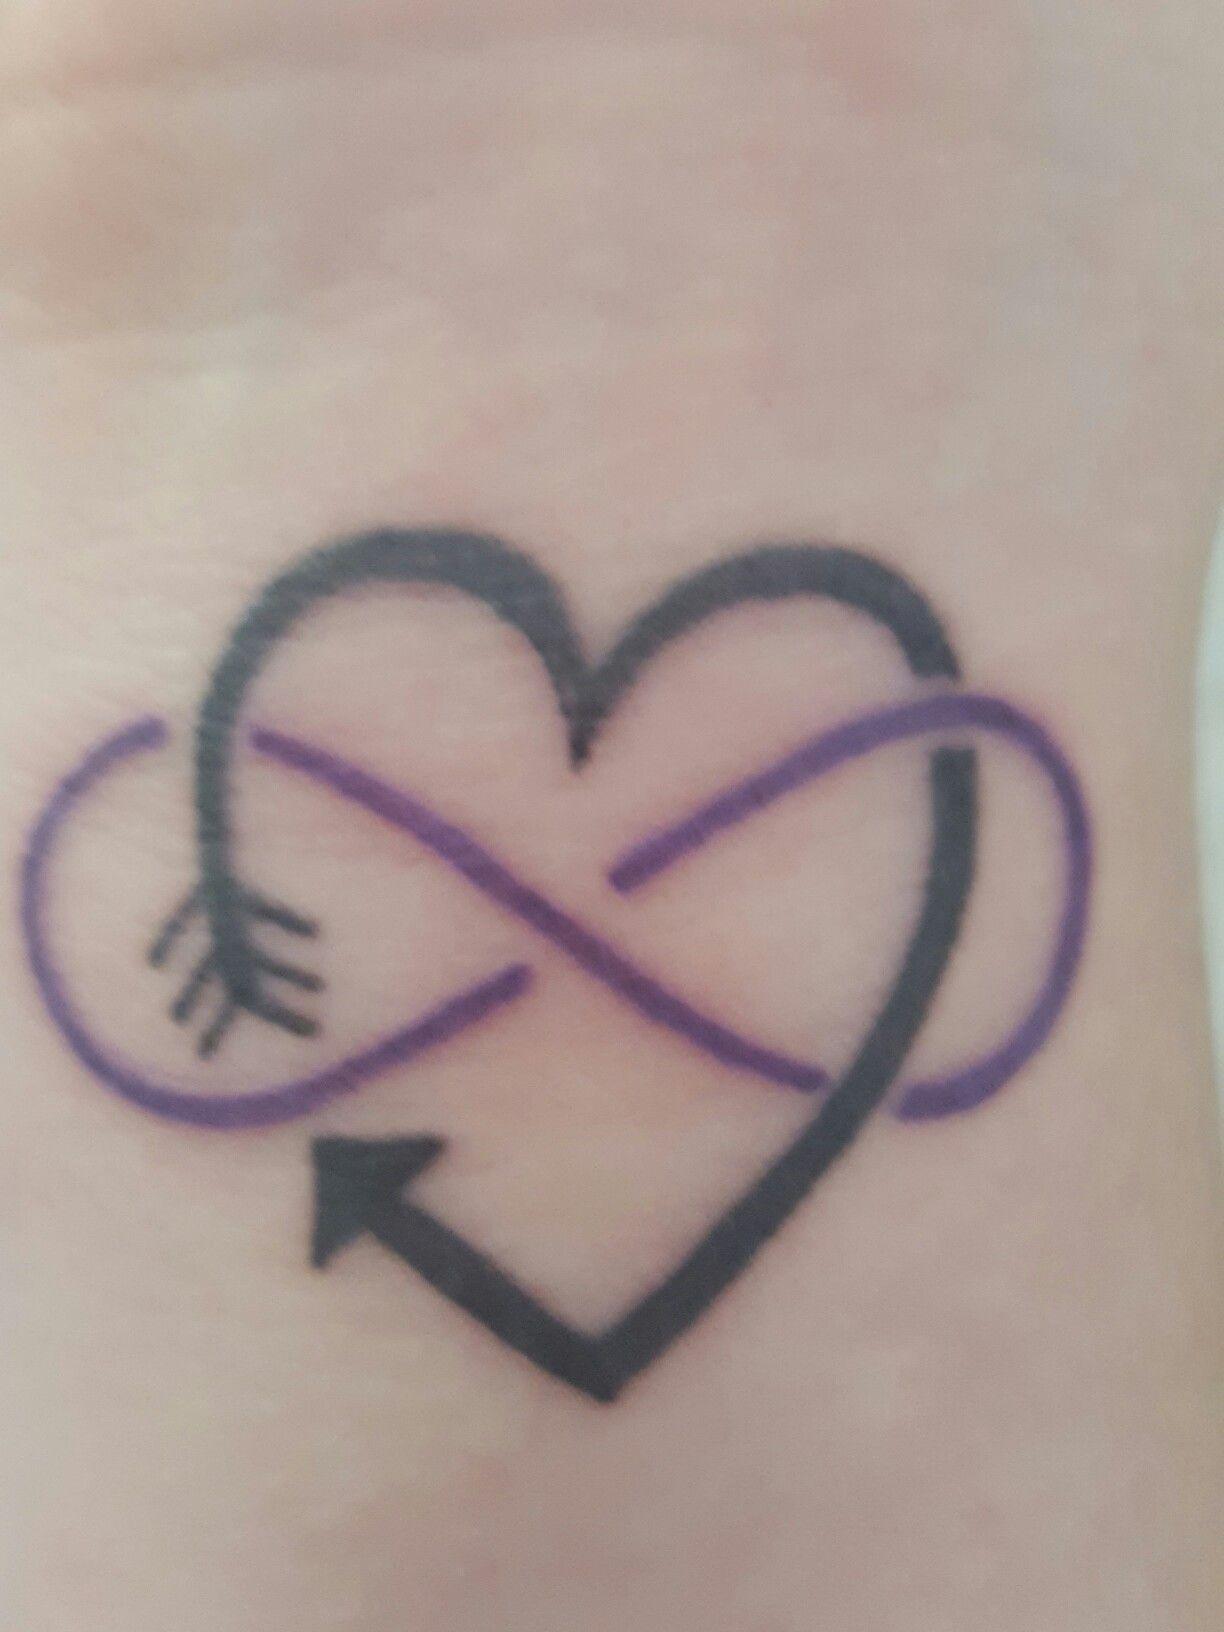 17ae0c5ae0d08 My first tattoo - arrow heart with purple infinity   Tattoos   Arrow ...